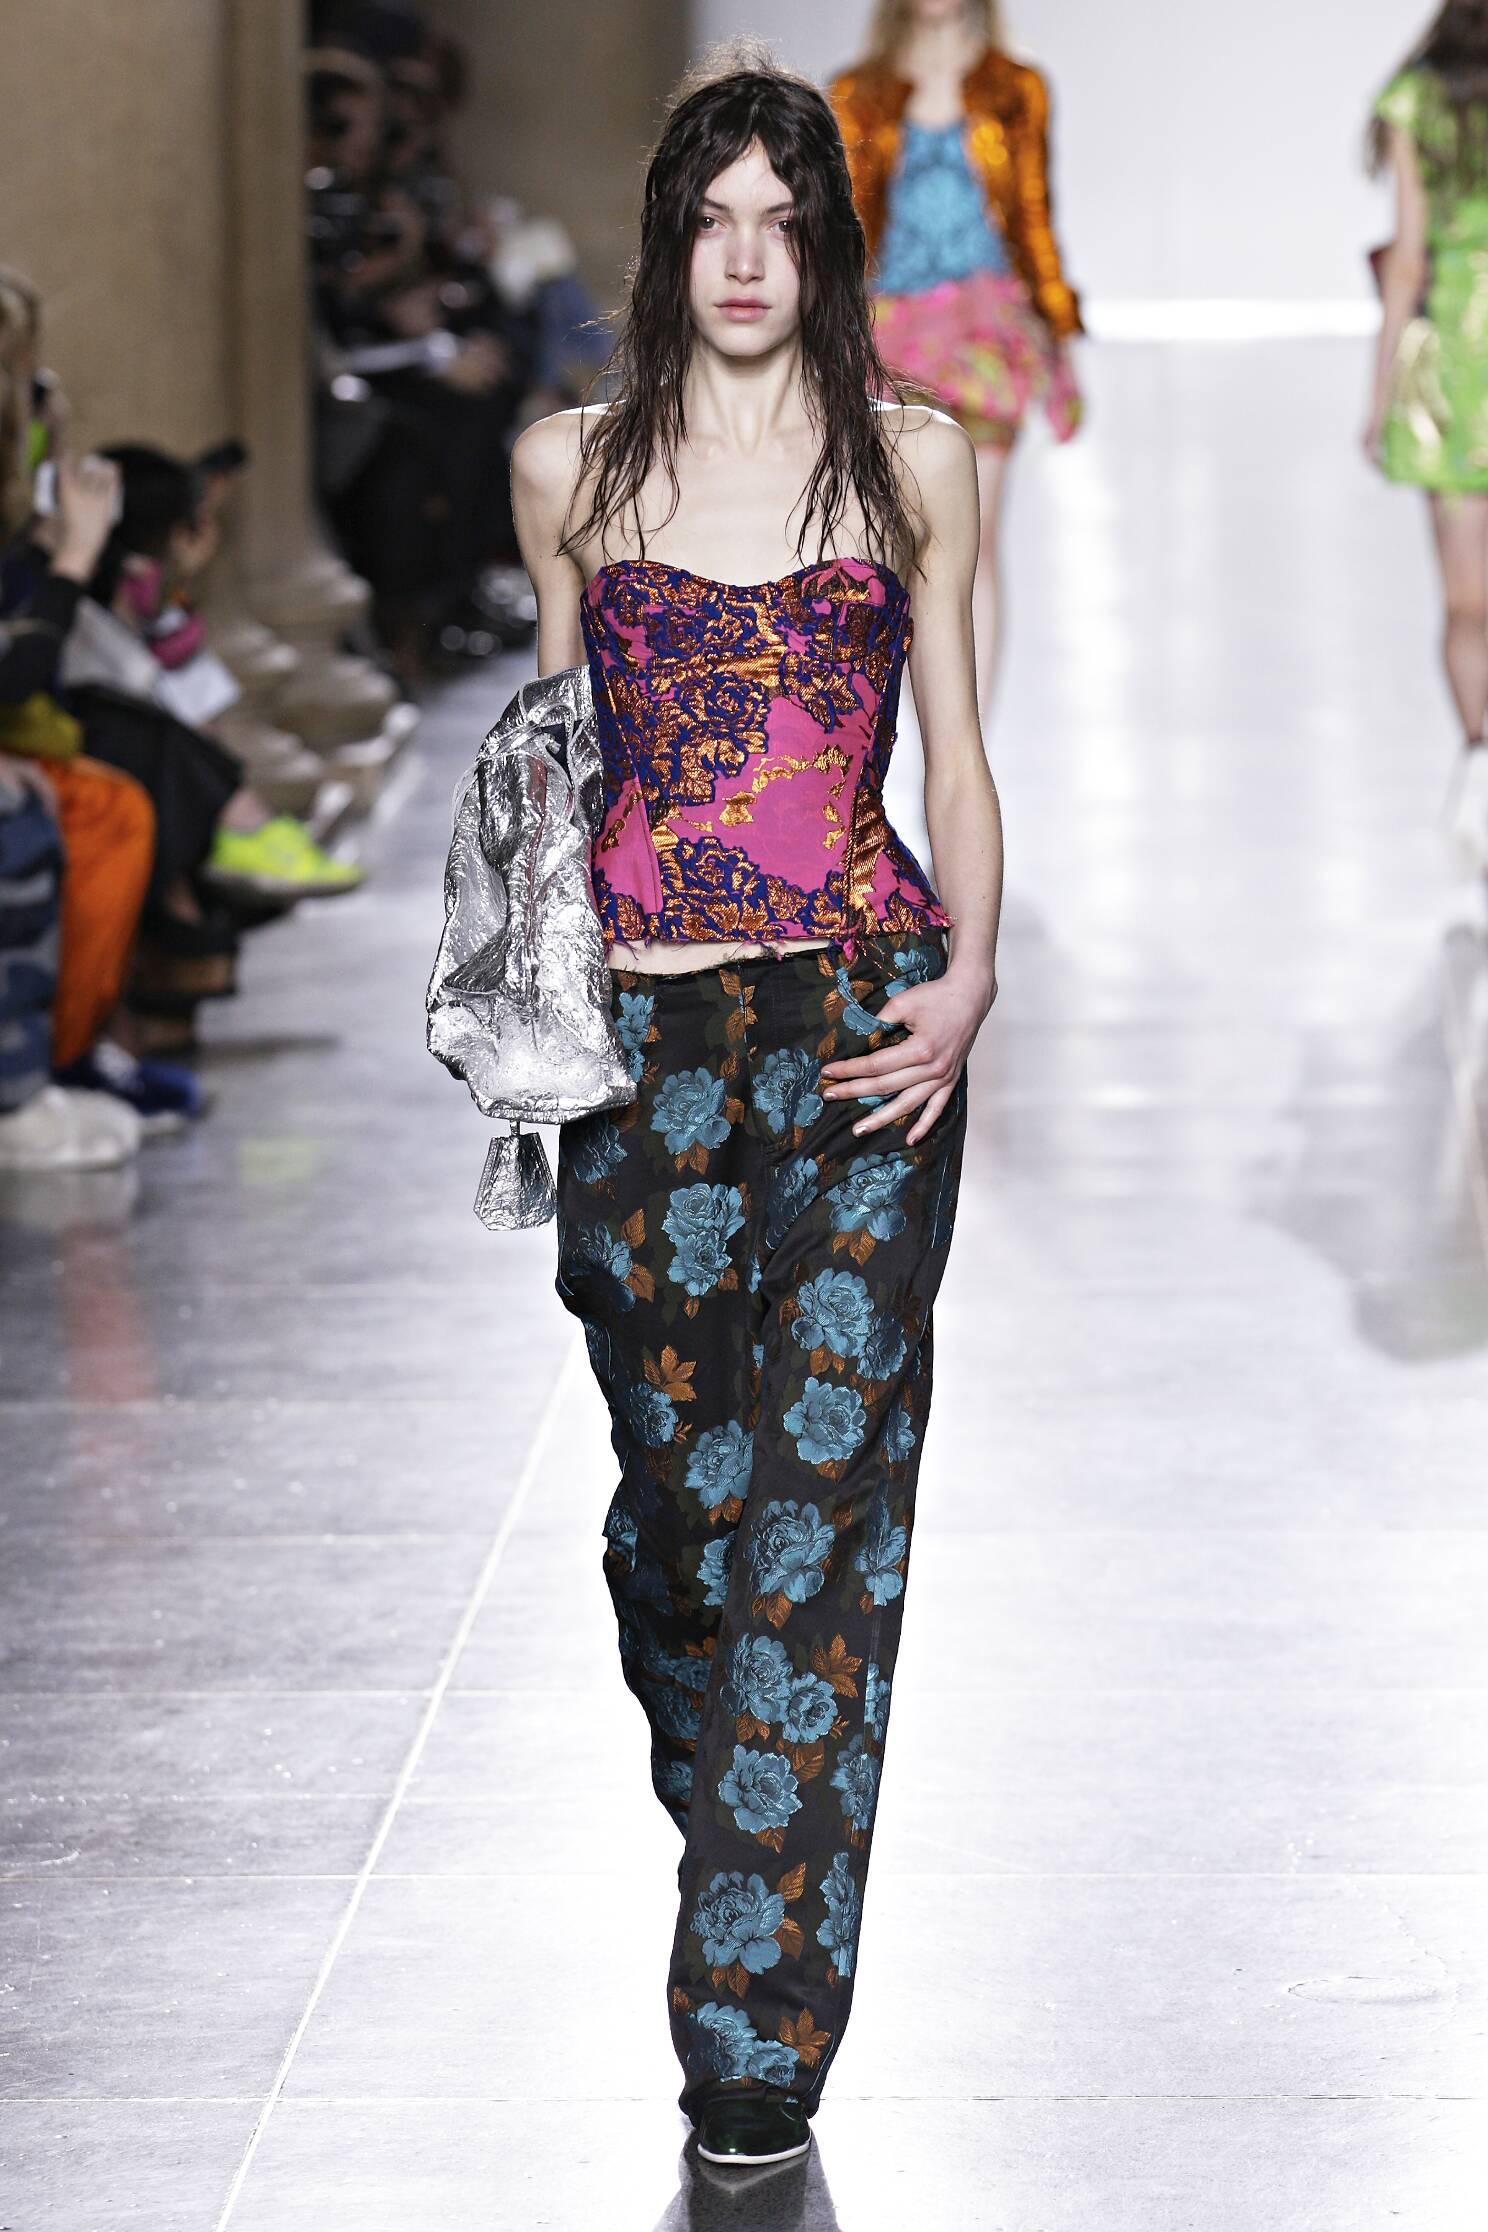 Catwalk Marques Almeida Collection Fashion Show Winter 2015